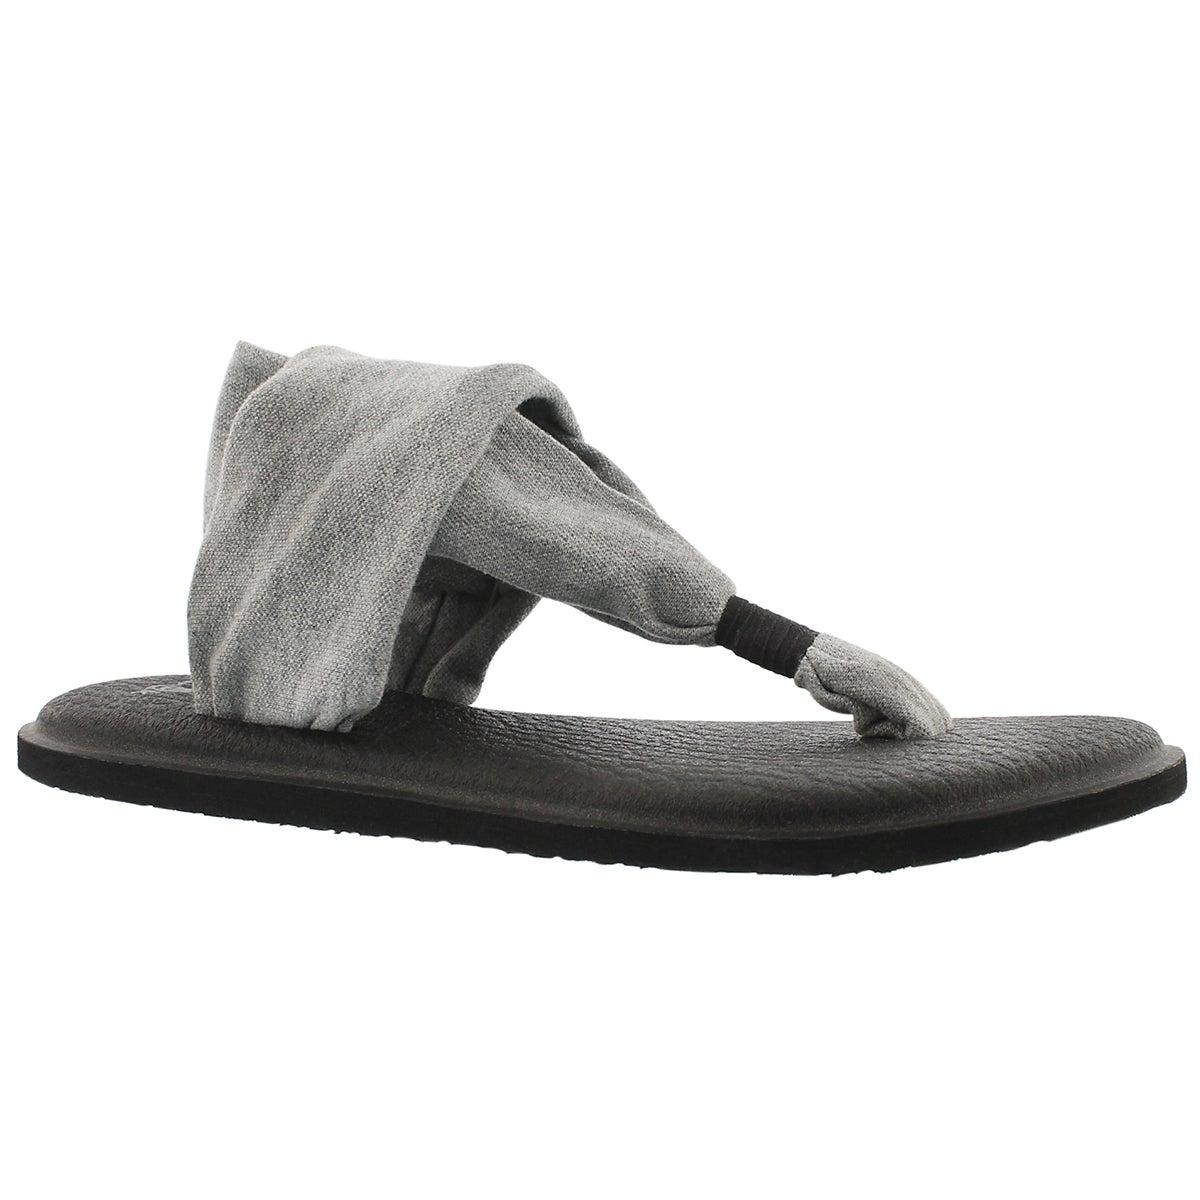 Lds Yoga Sling grey thong sandal